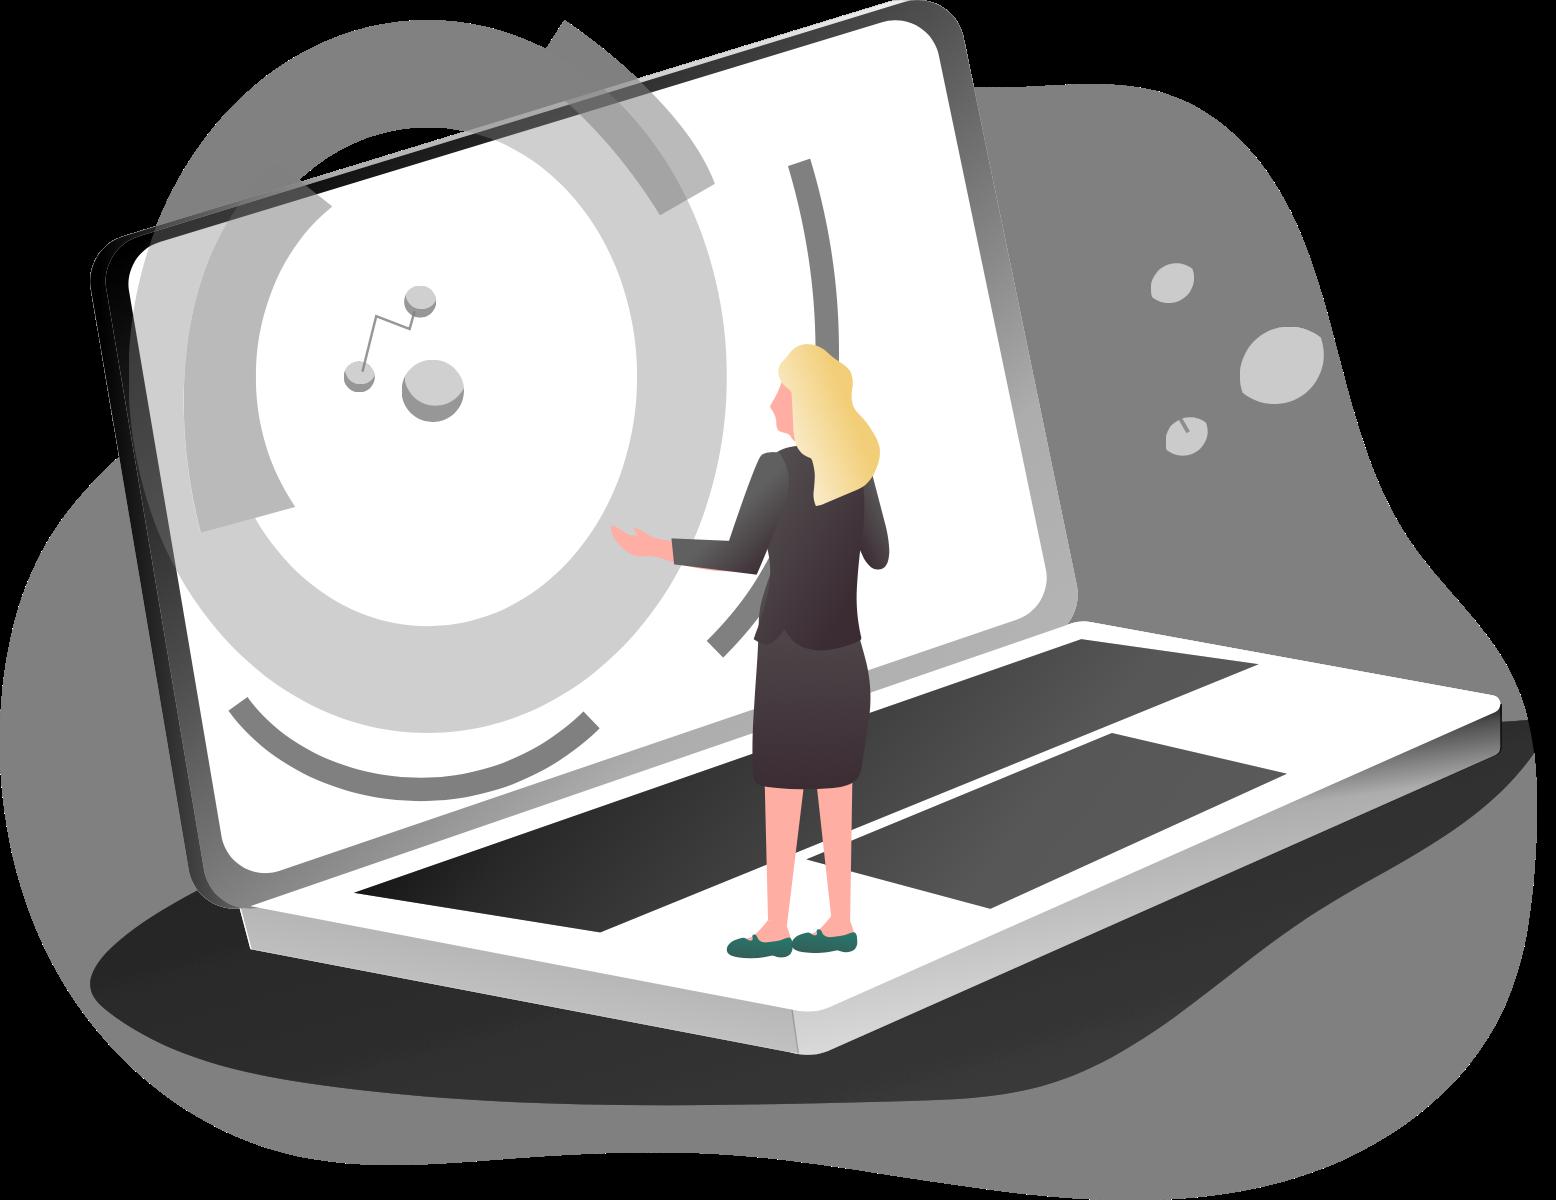 Client Login illustration